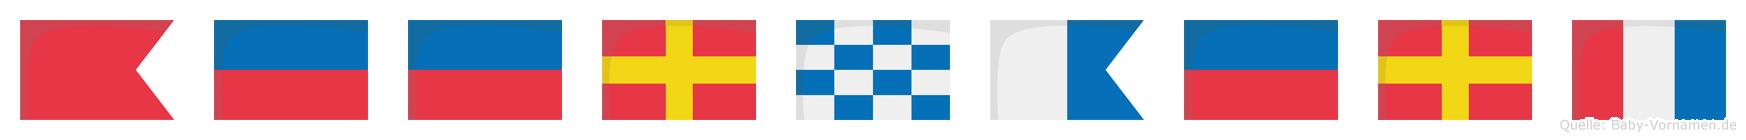 Beernaert im Flaggenalphabet